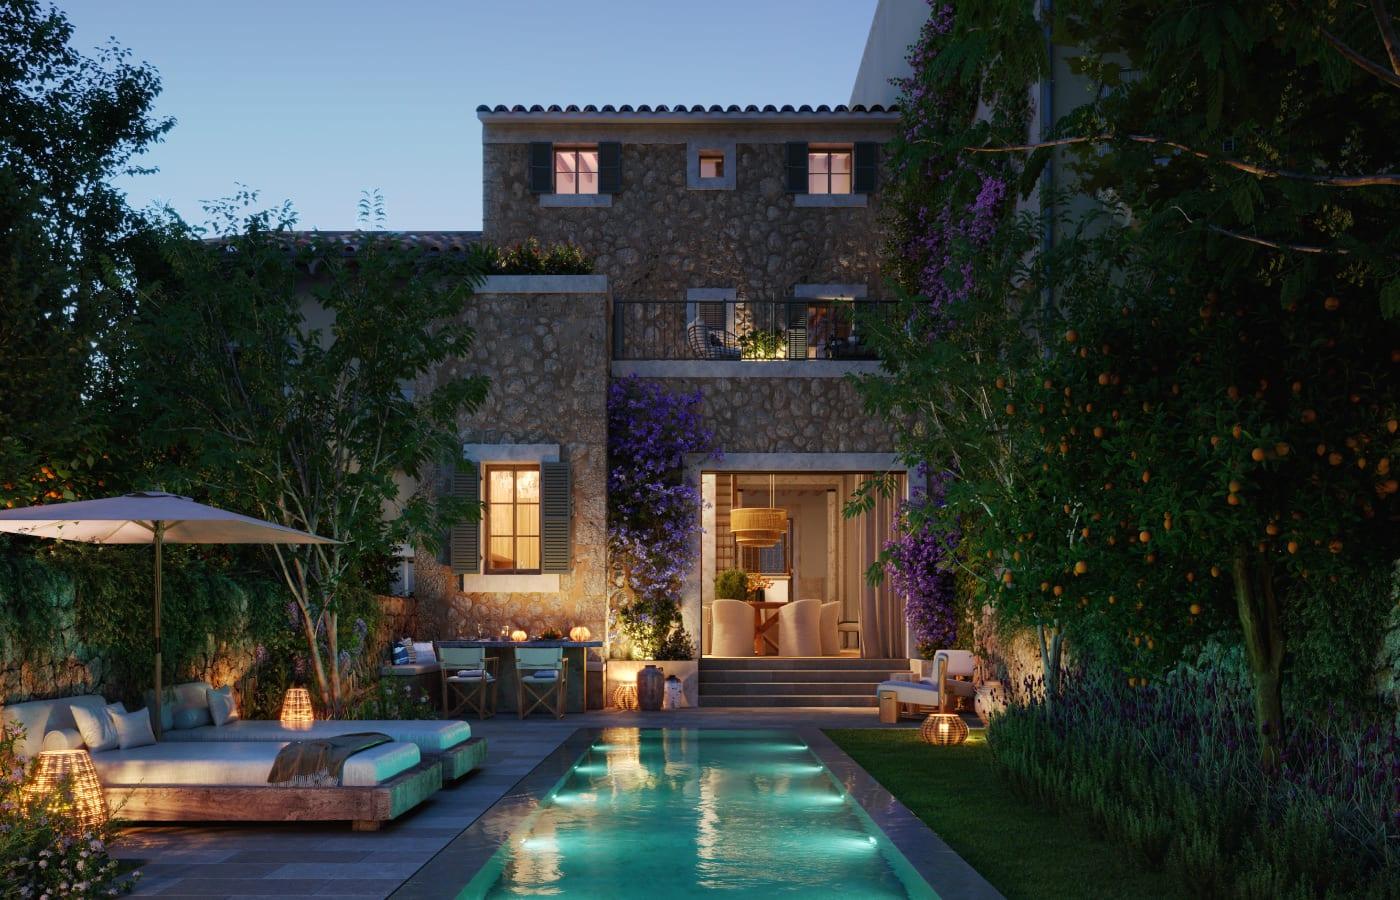 Casa Mares by Night Mallorca